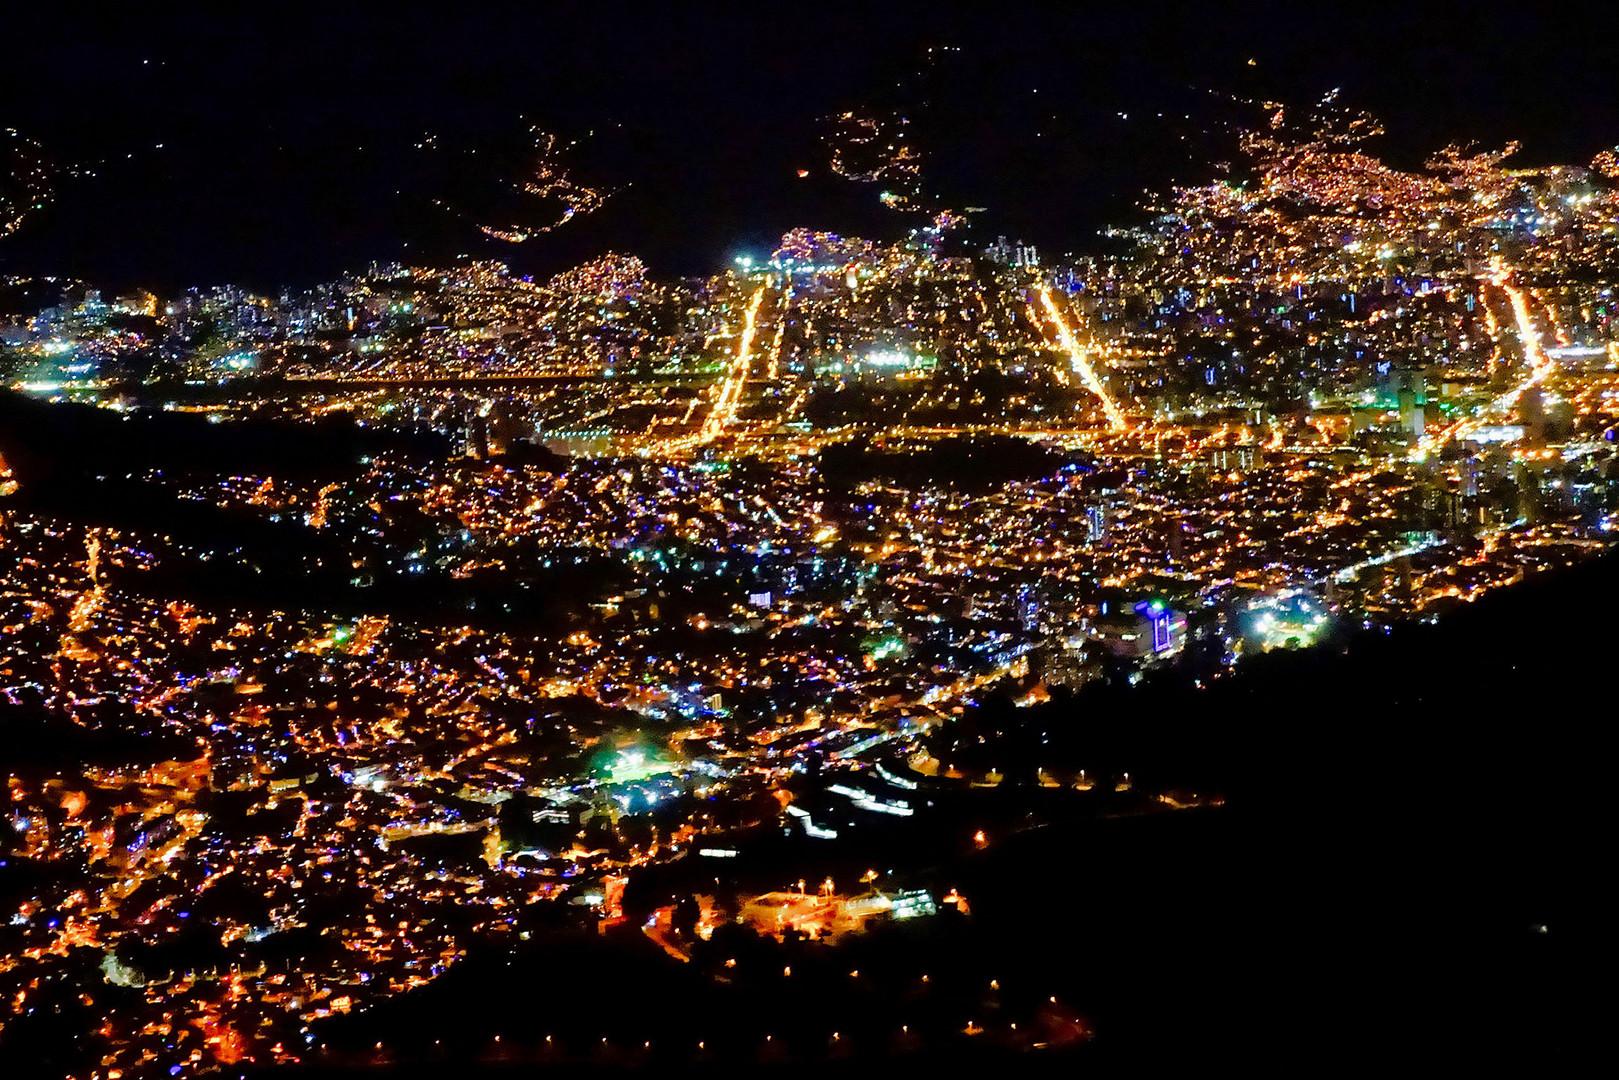 2019.01.01, Medellin, Colombia